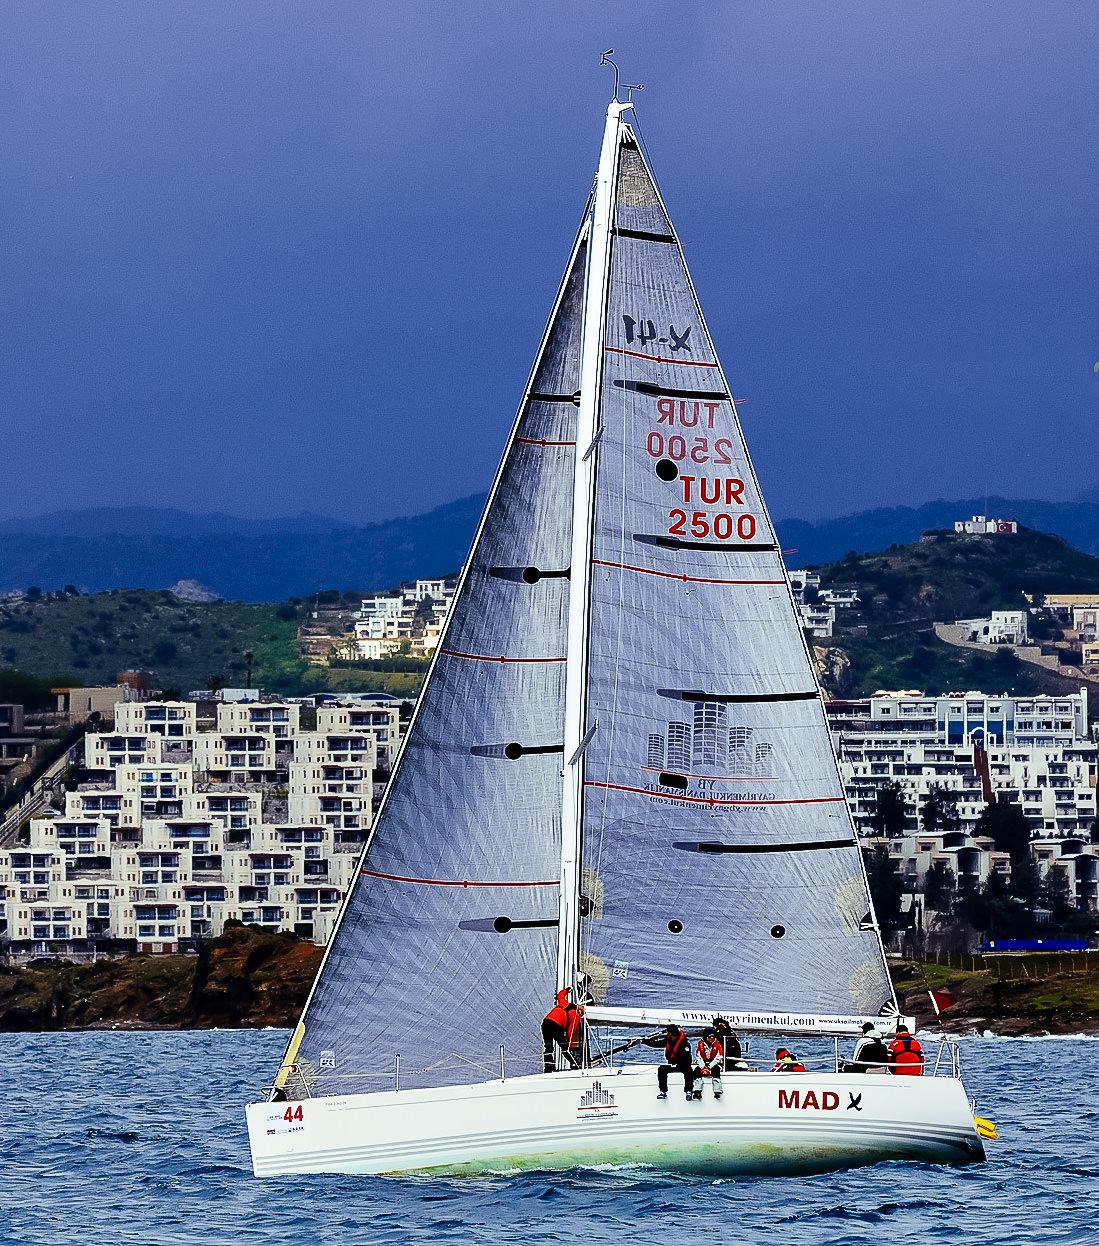 UK+Sailmakers+Racing+Geona+Options+Draft+Stripes+X41Titanium.jpg